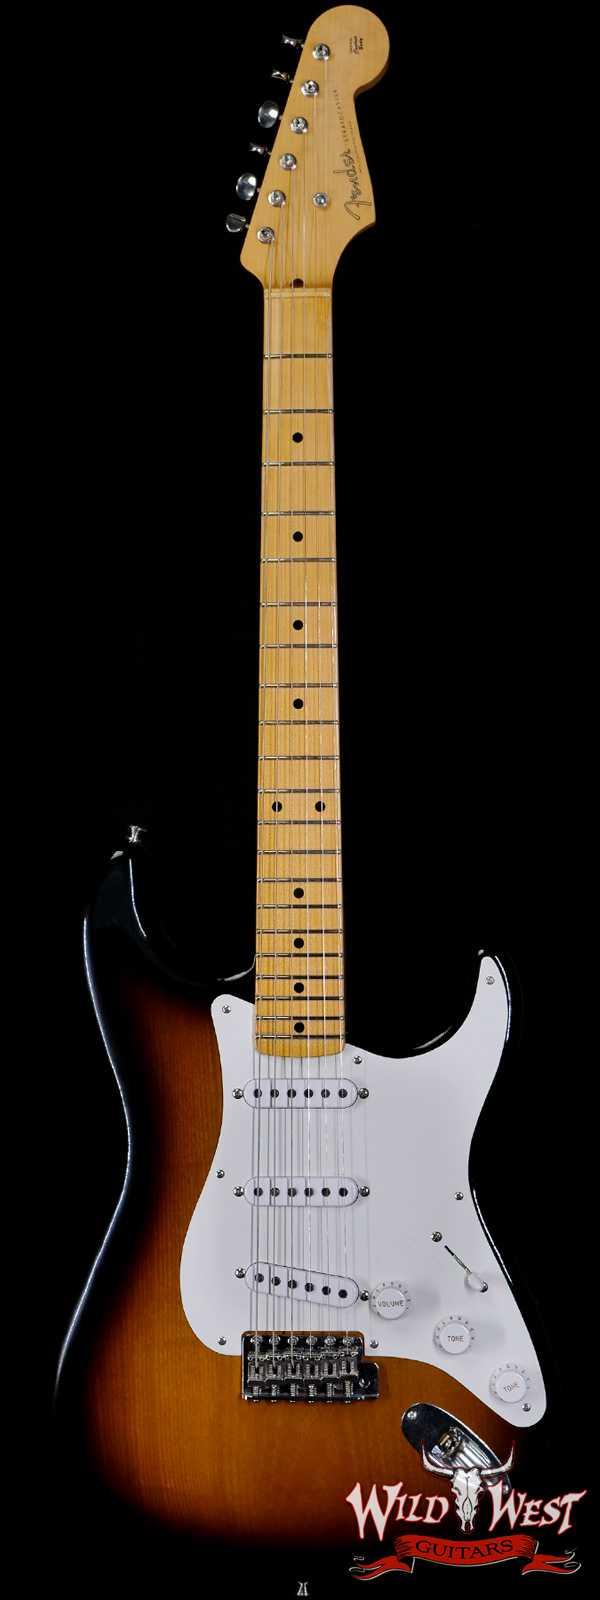 Fender Custom Shop Chris Fleming Masterbuilt 1954 Stratocaster Closet Classic 2 Tone Sunburst Josefina Hand-Wound Pikcups